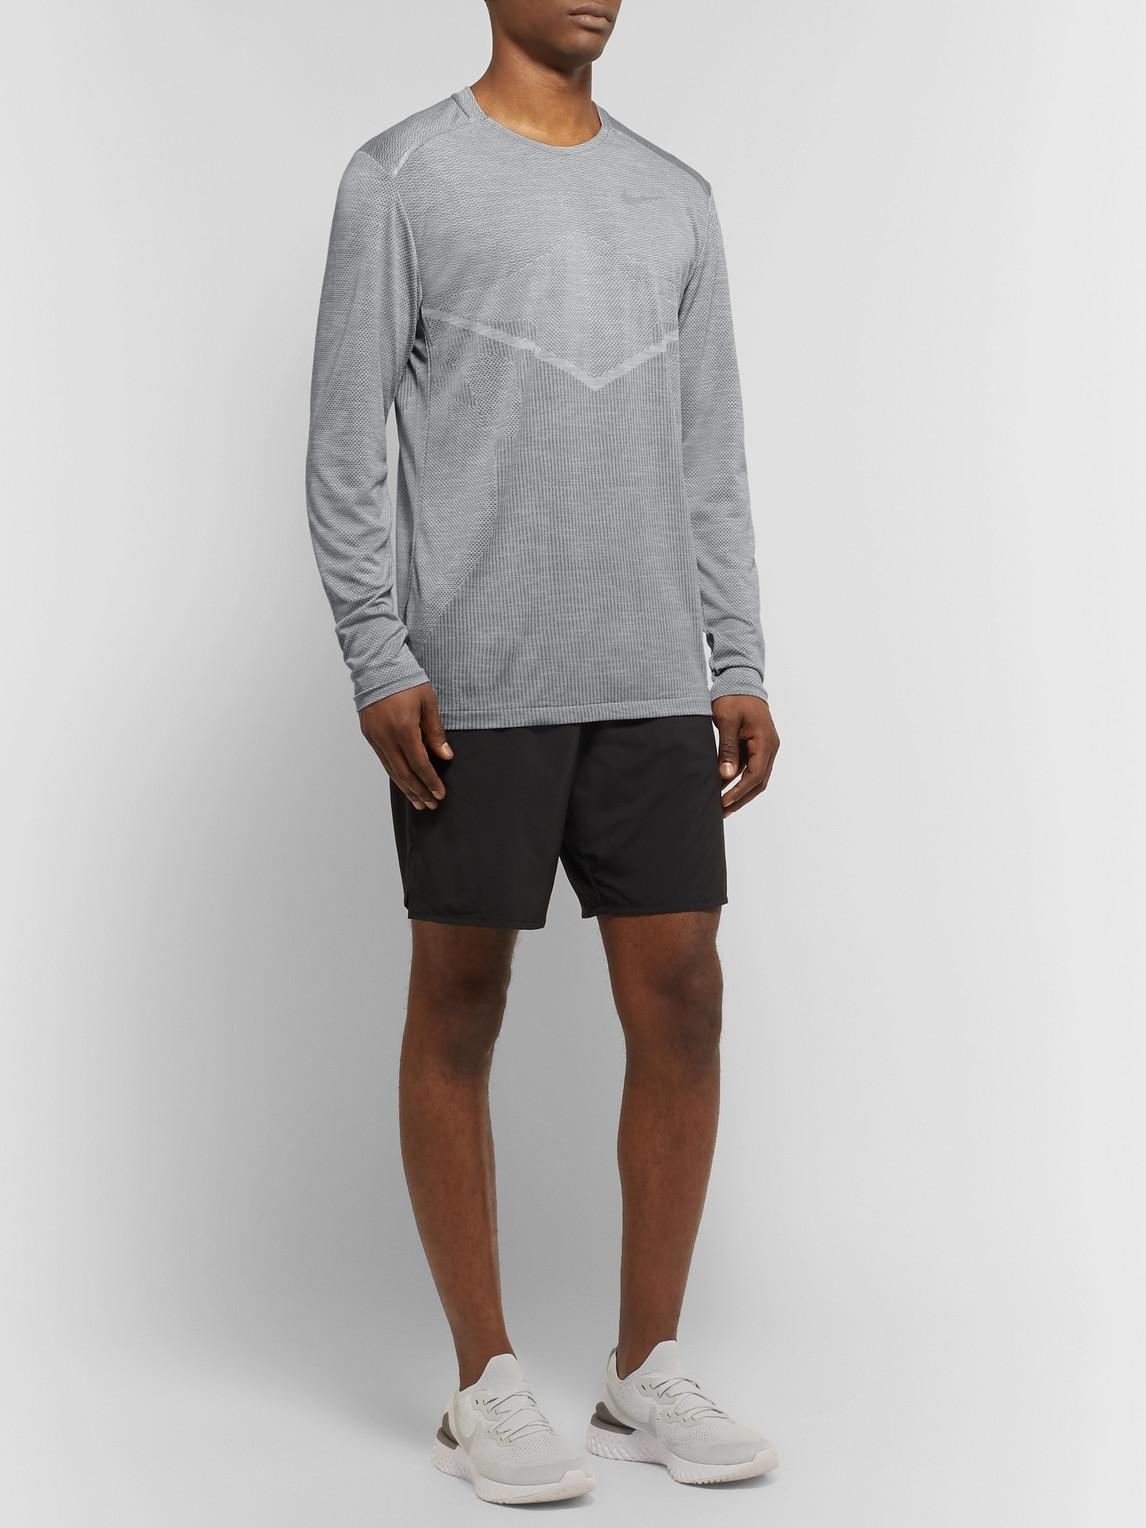 Nike Shorts TECHKNIT COOL ULTRA DRI